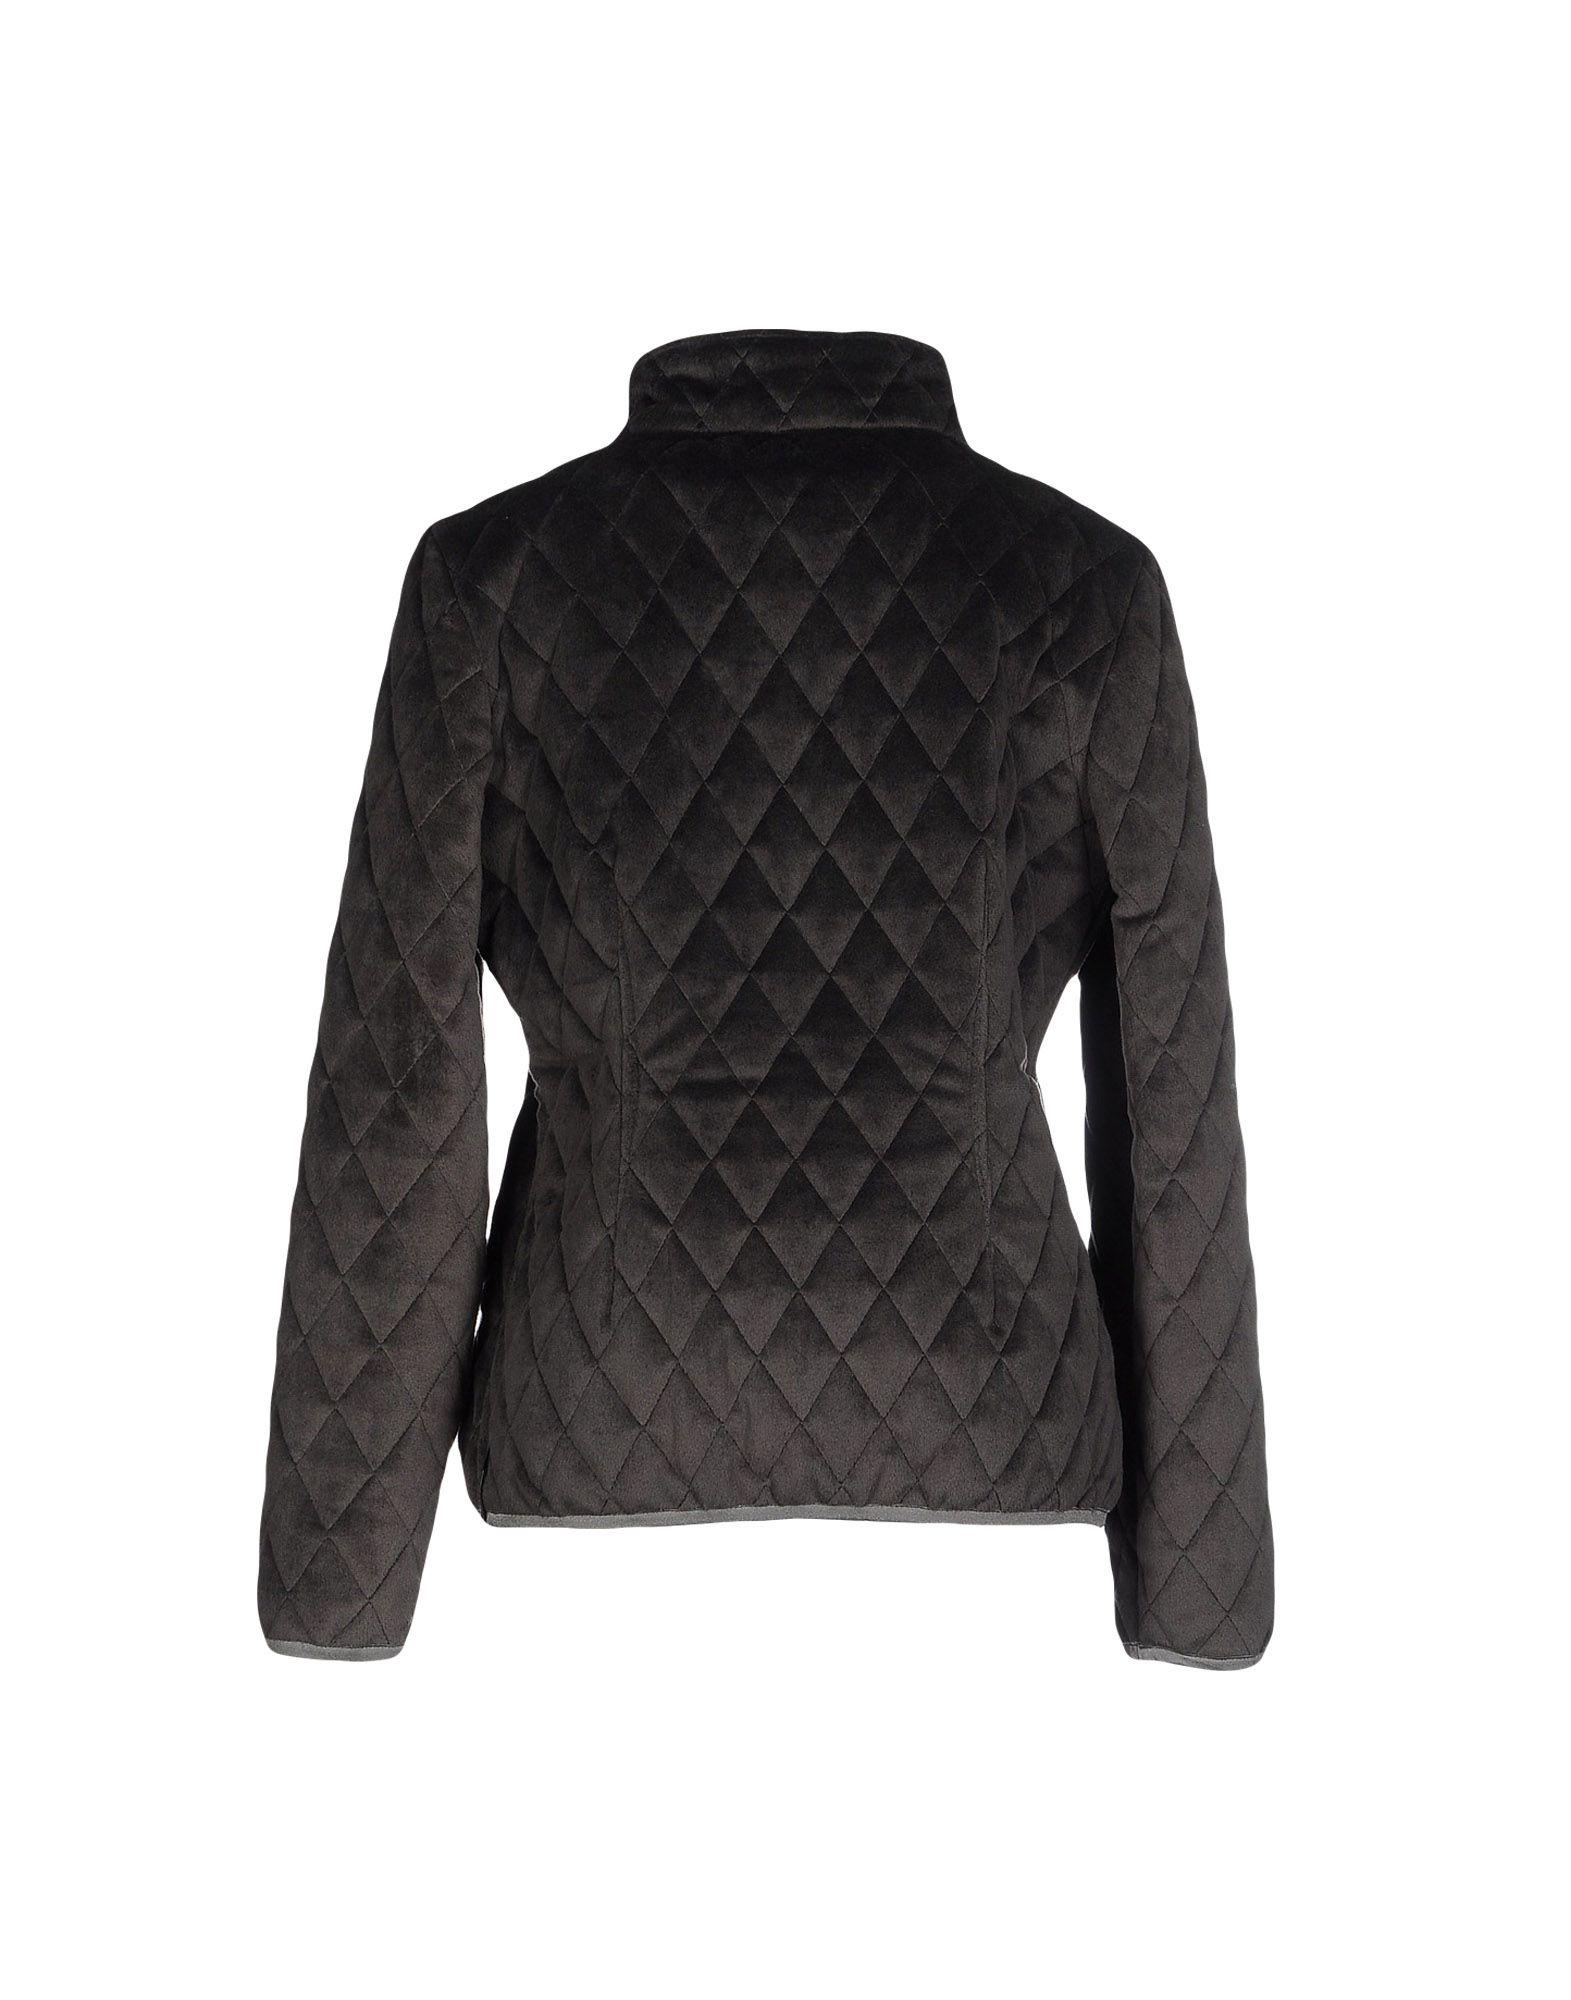 Lyst Brebis Noir Jacket In Black